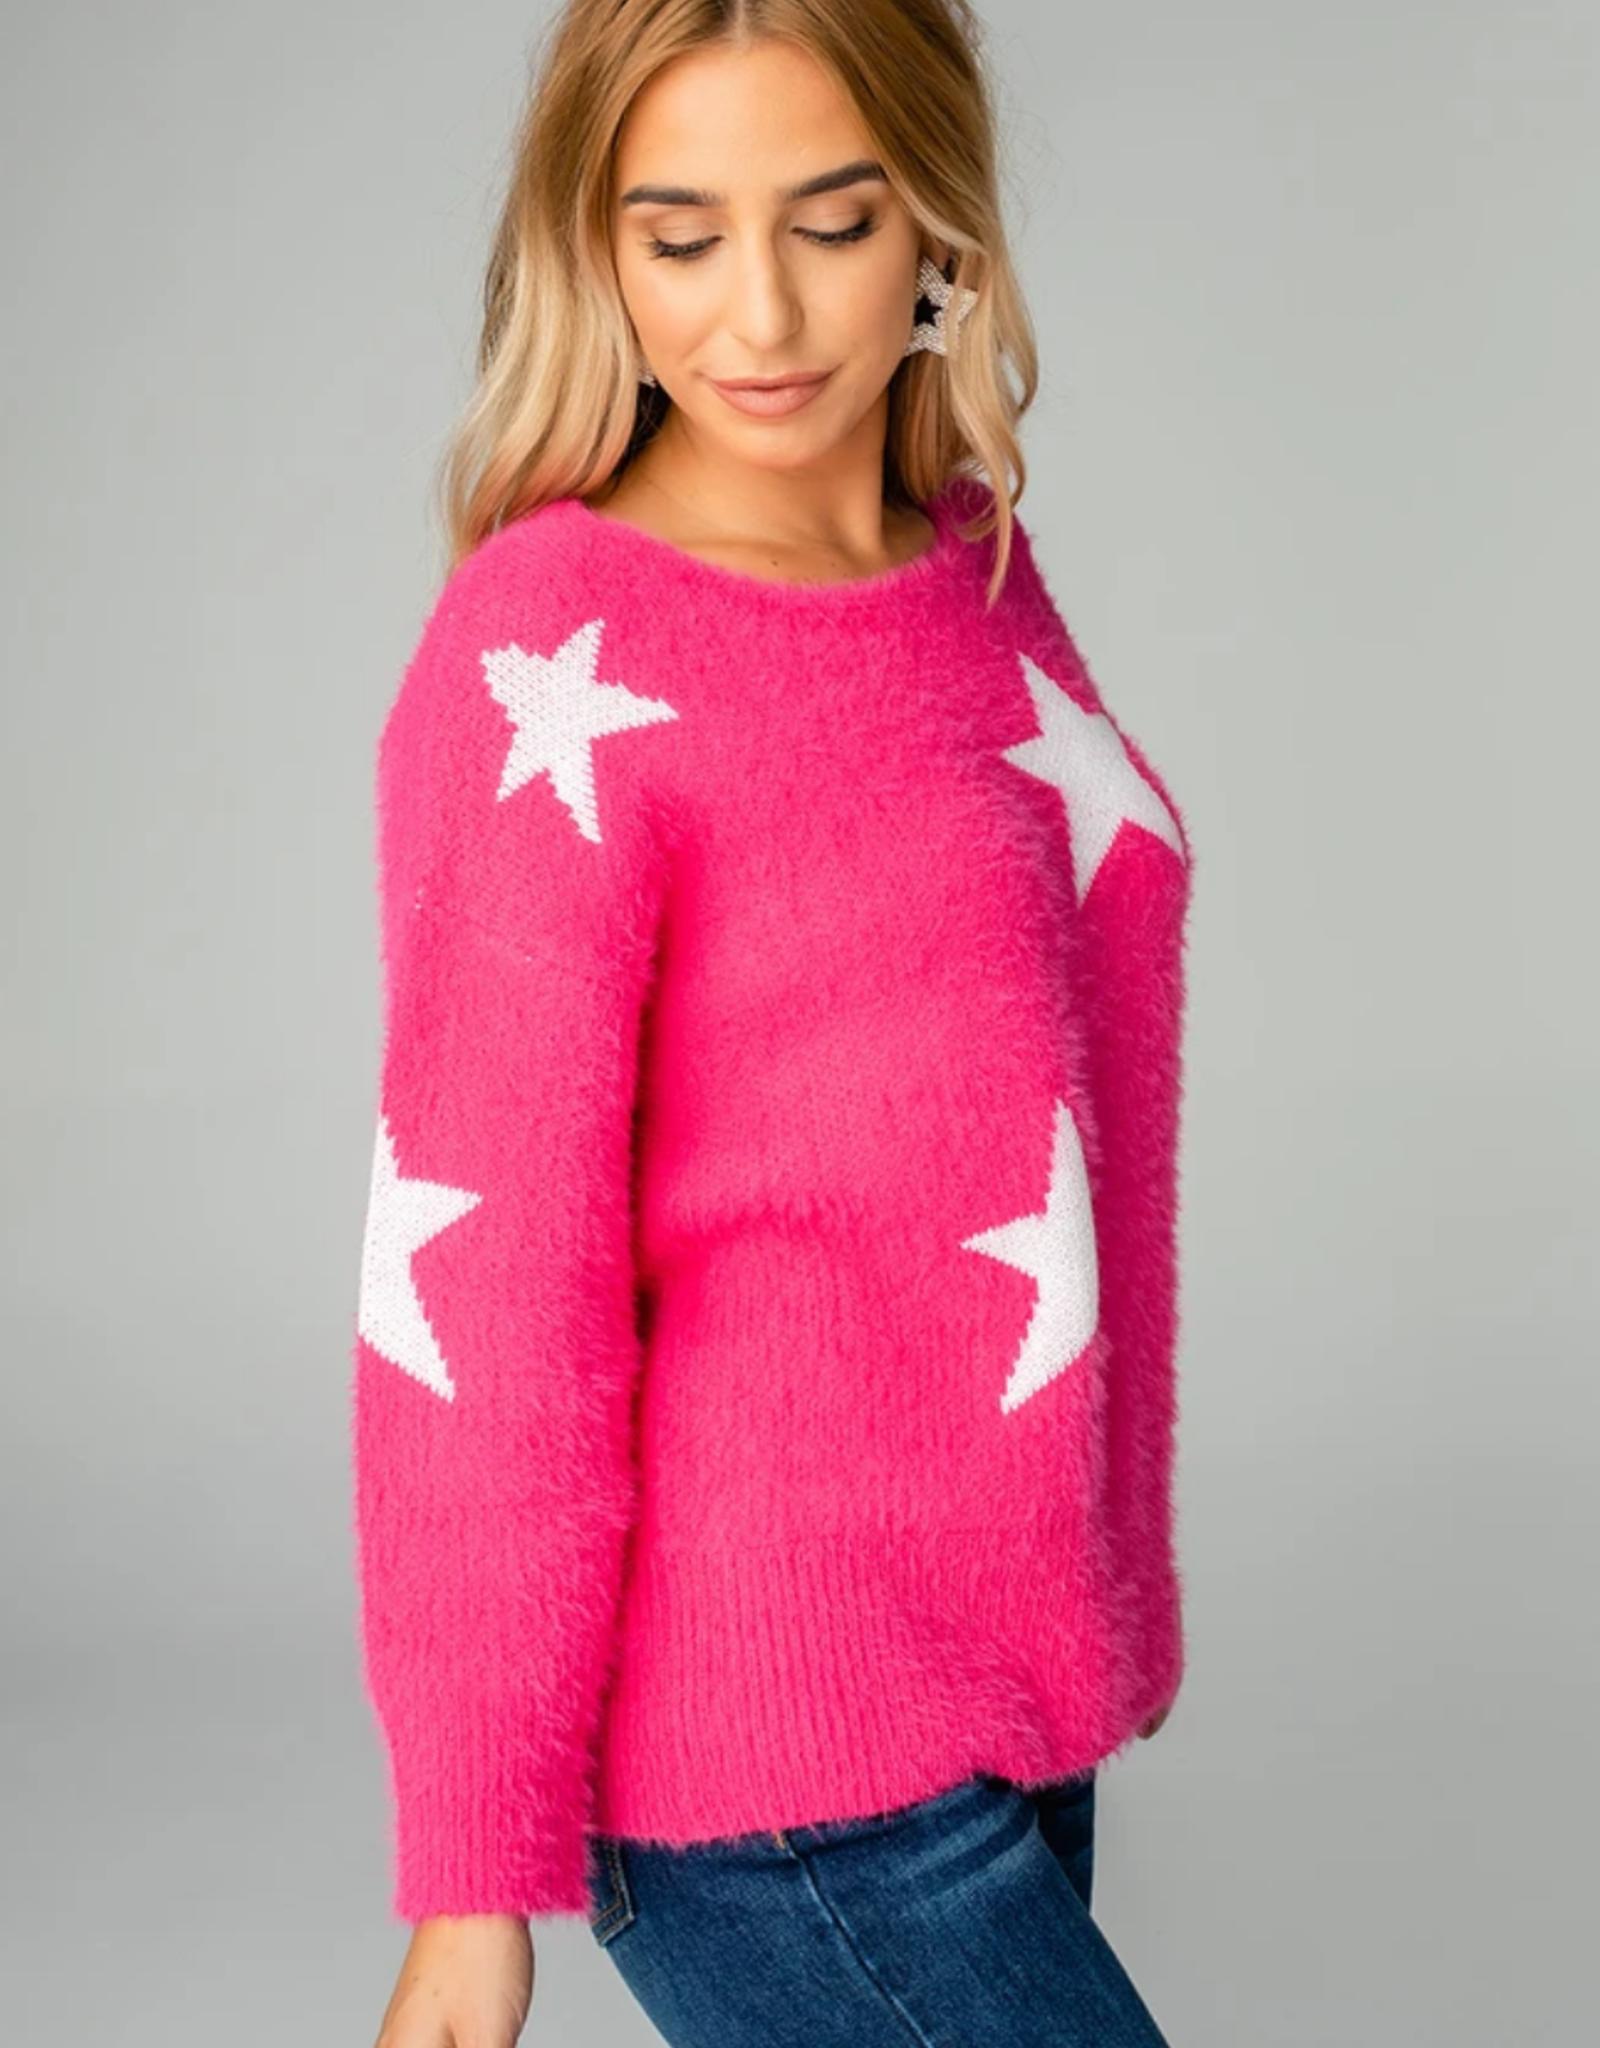 Buddy Love Spears Star Sweater